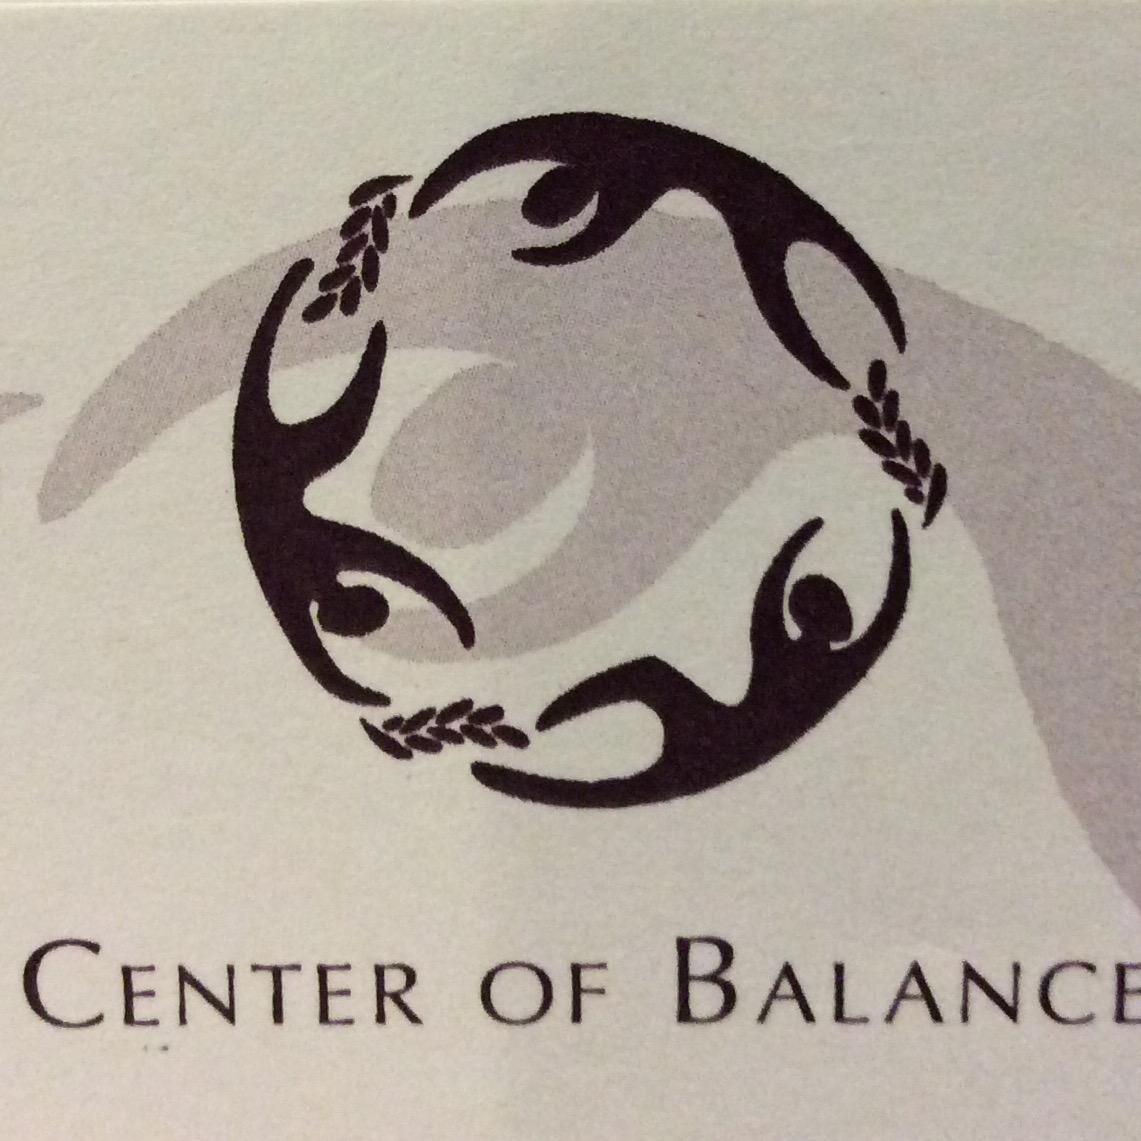 Center of Balance - North Kingston, RI - Clinics